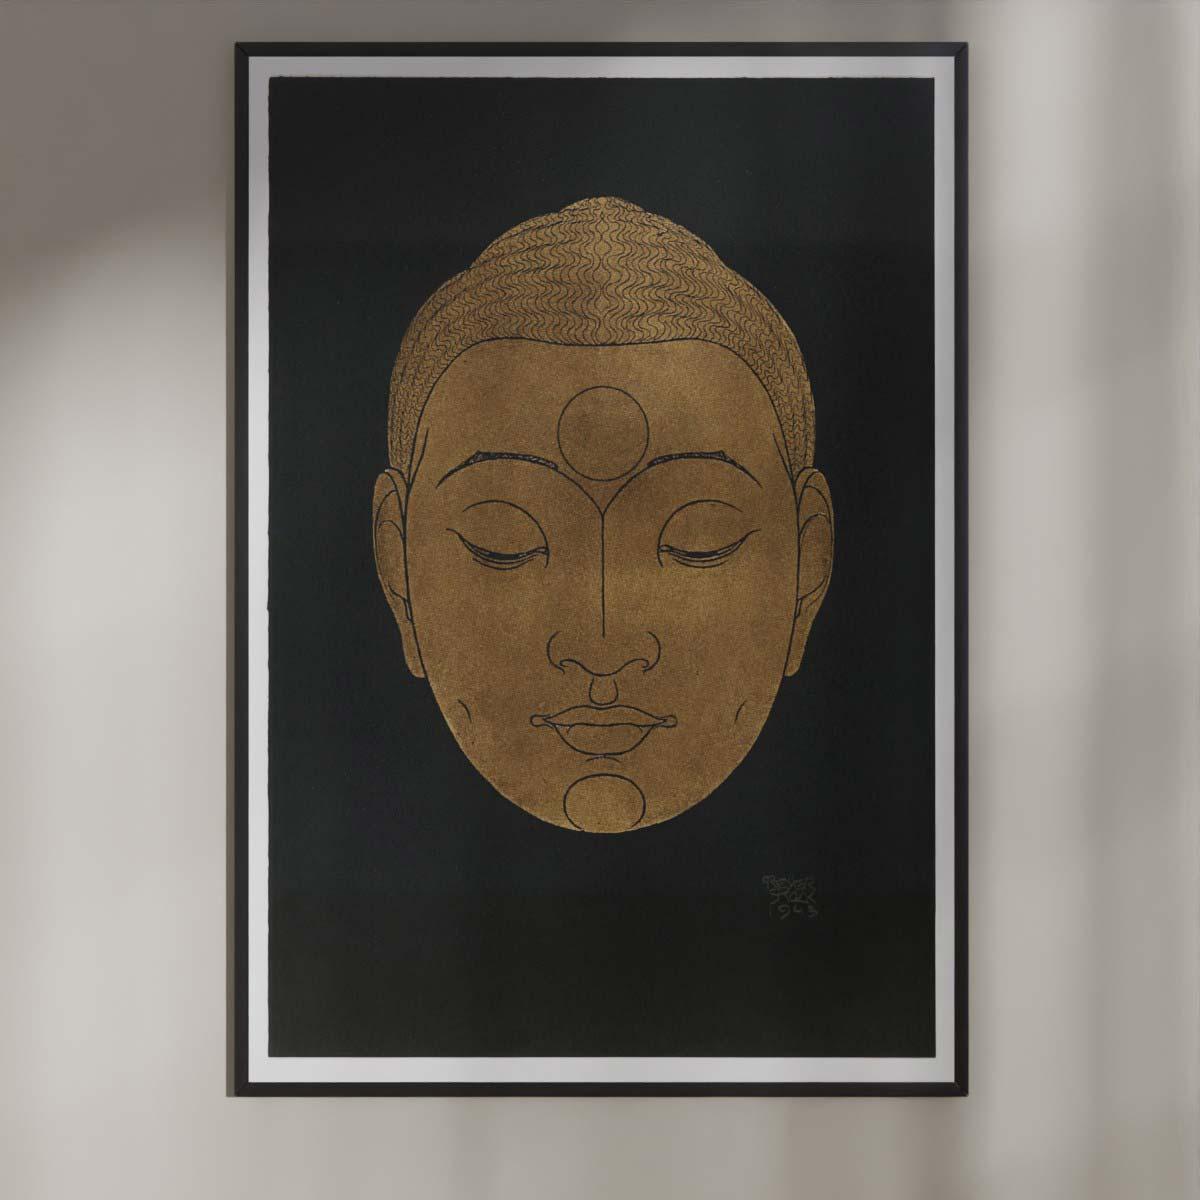 Plakat - Buddha-hoved på mørk baggrund - Reijer Stolk træsnit plakat